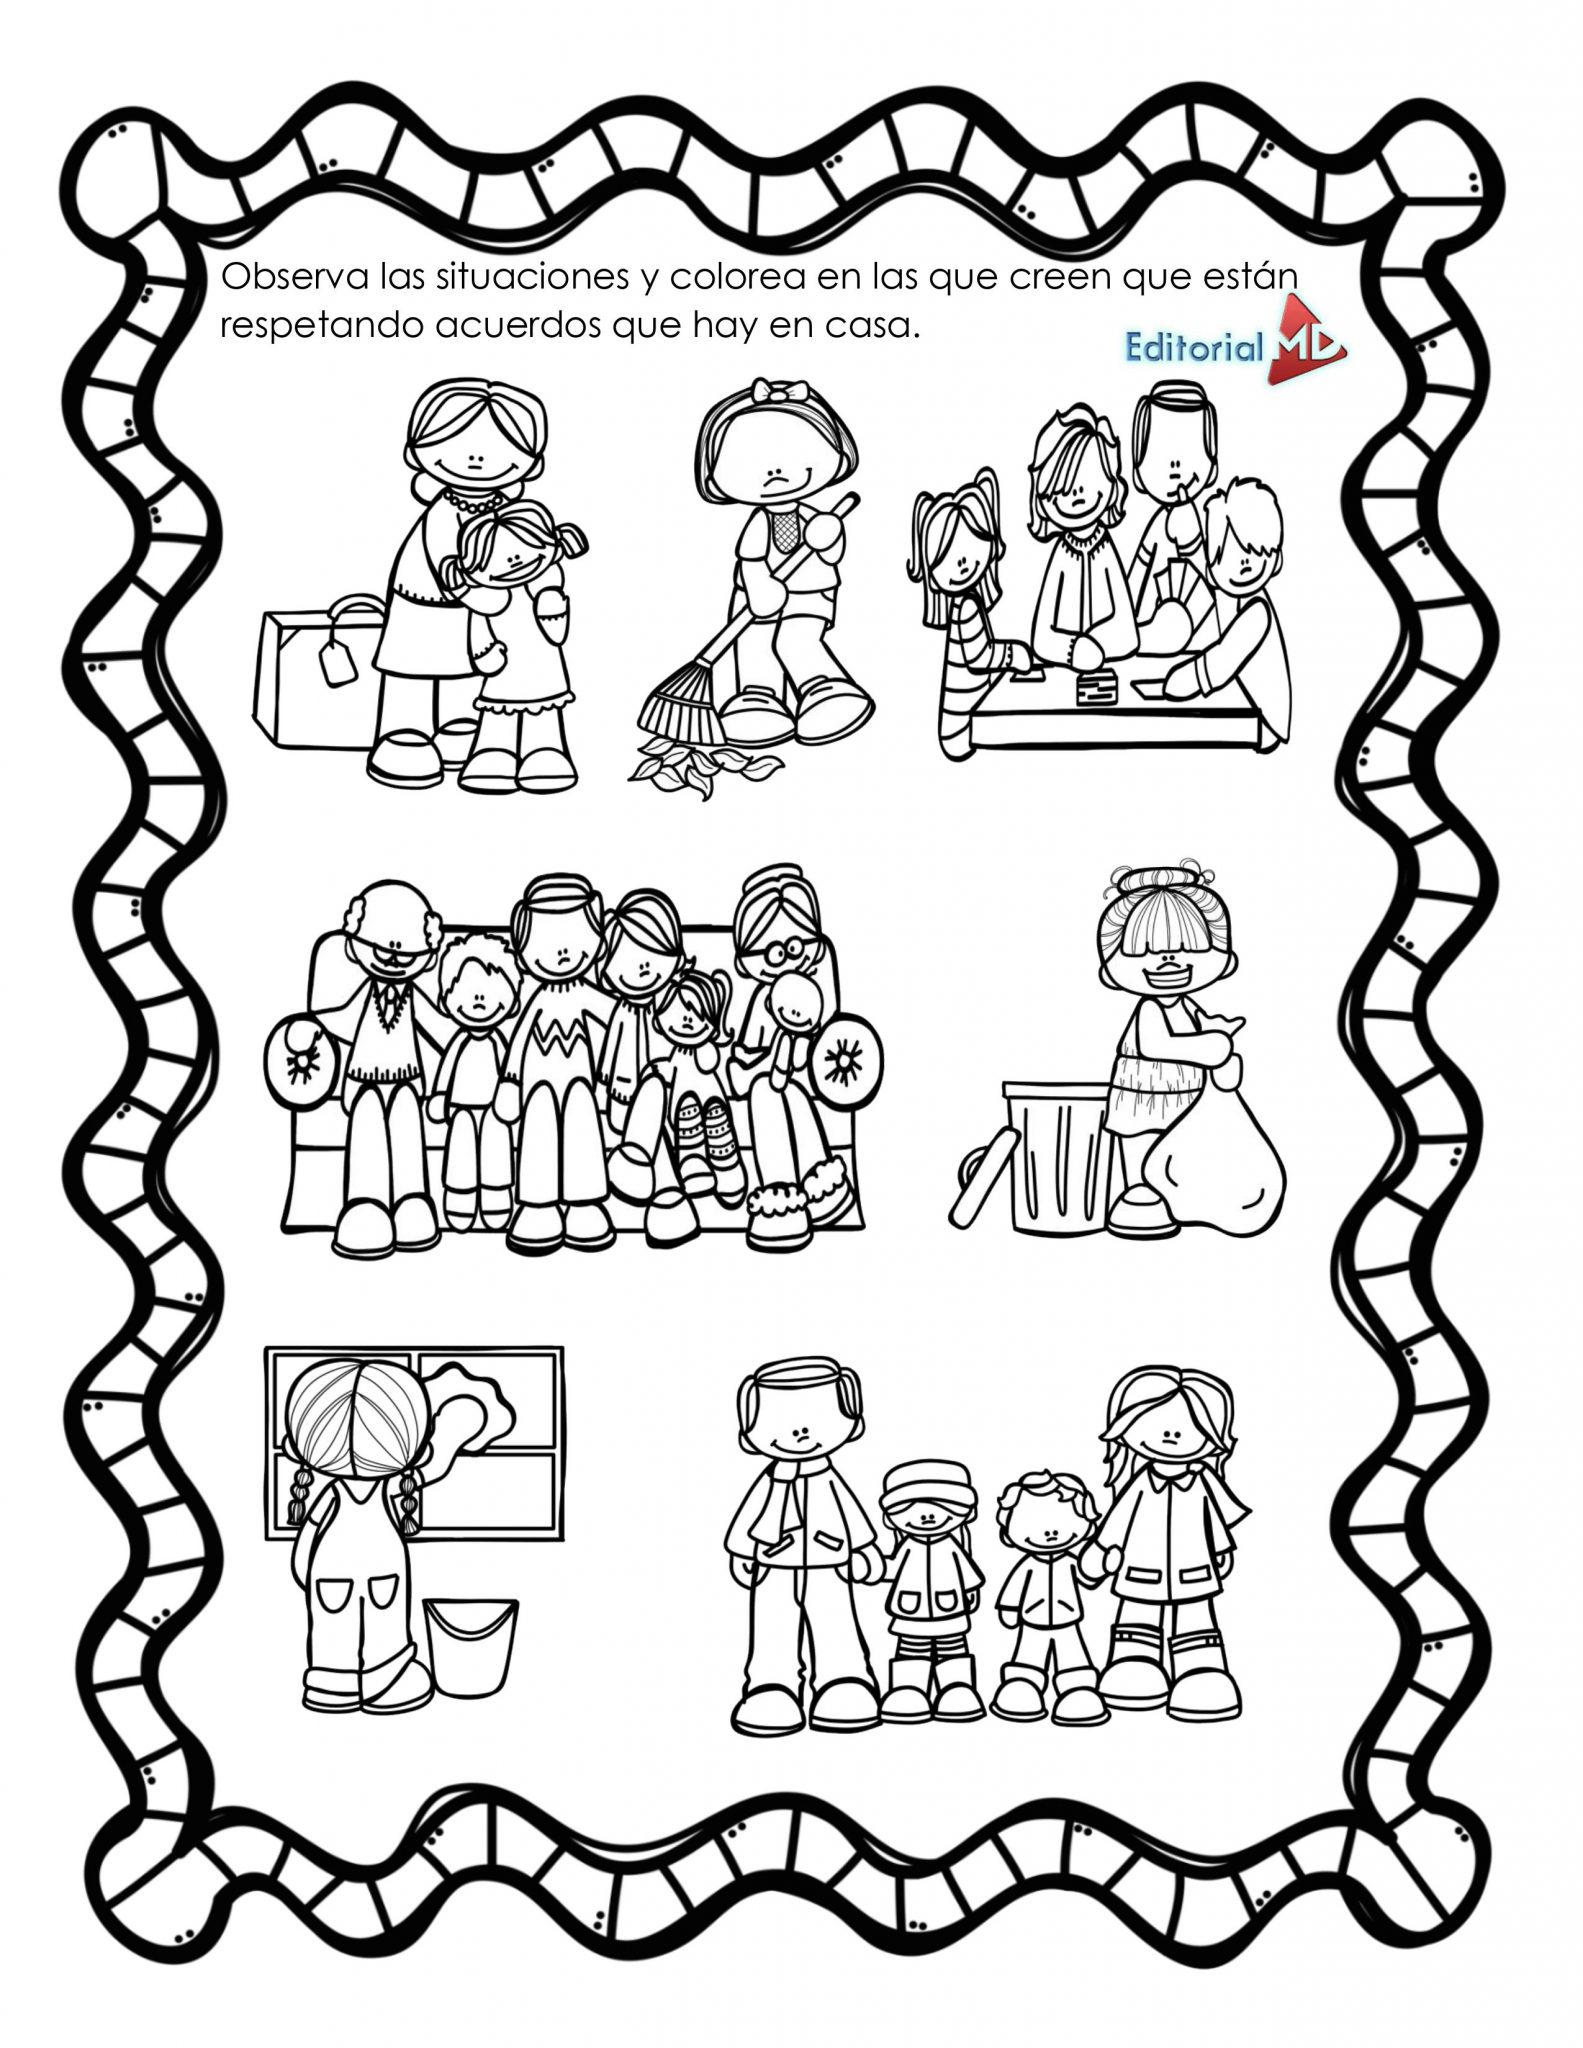 Ejemplo Material de apoyo semana 25 preescolar 02